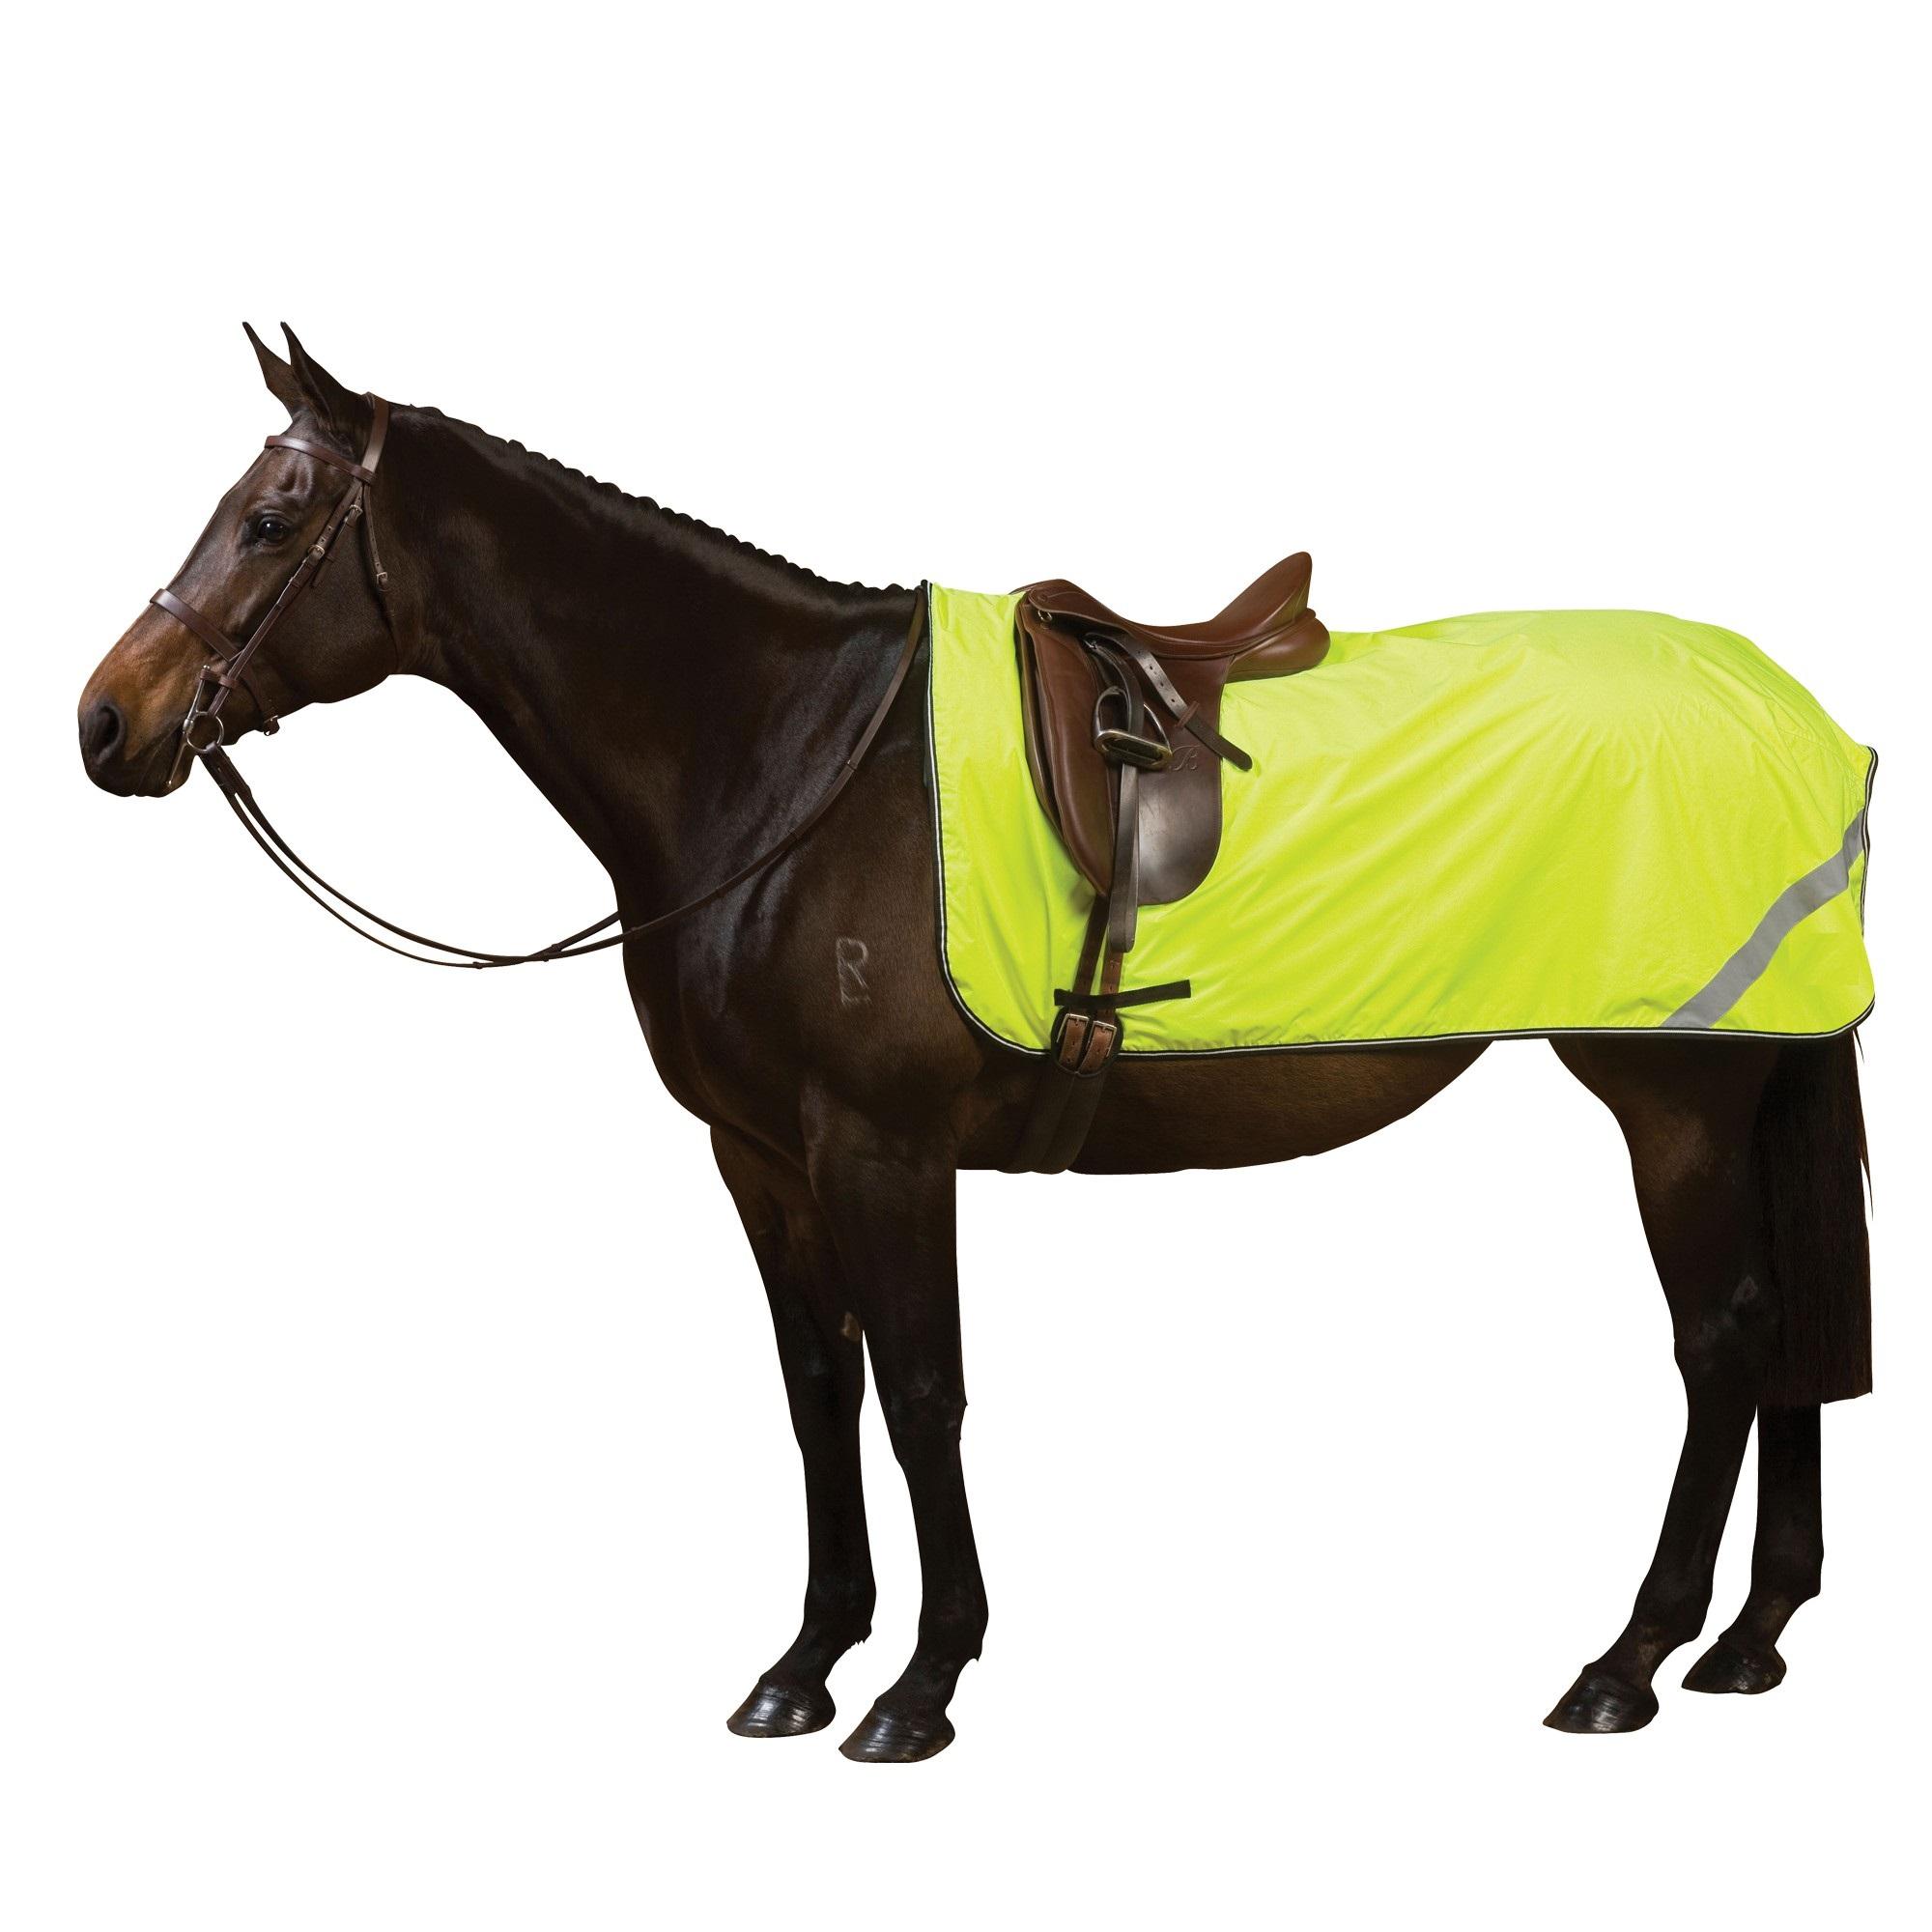 Horse Equipment Uk Equestrian Equipment Horse Riding